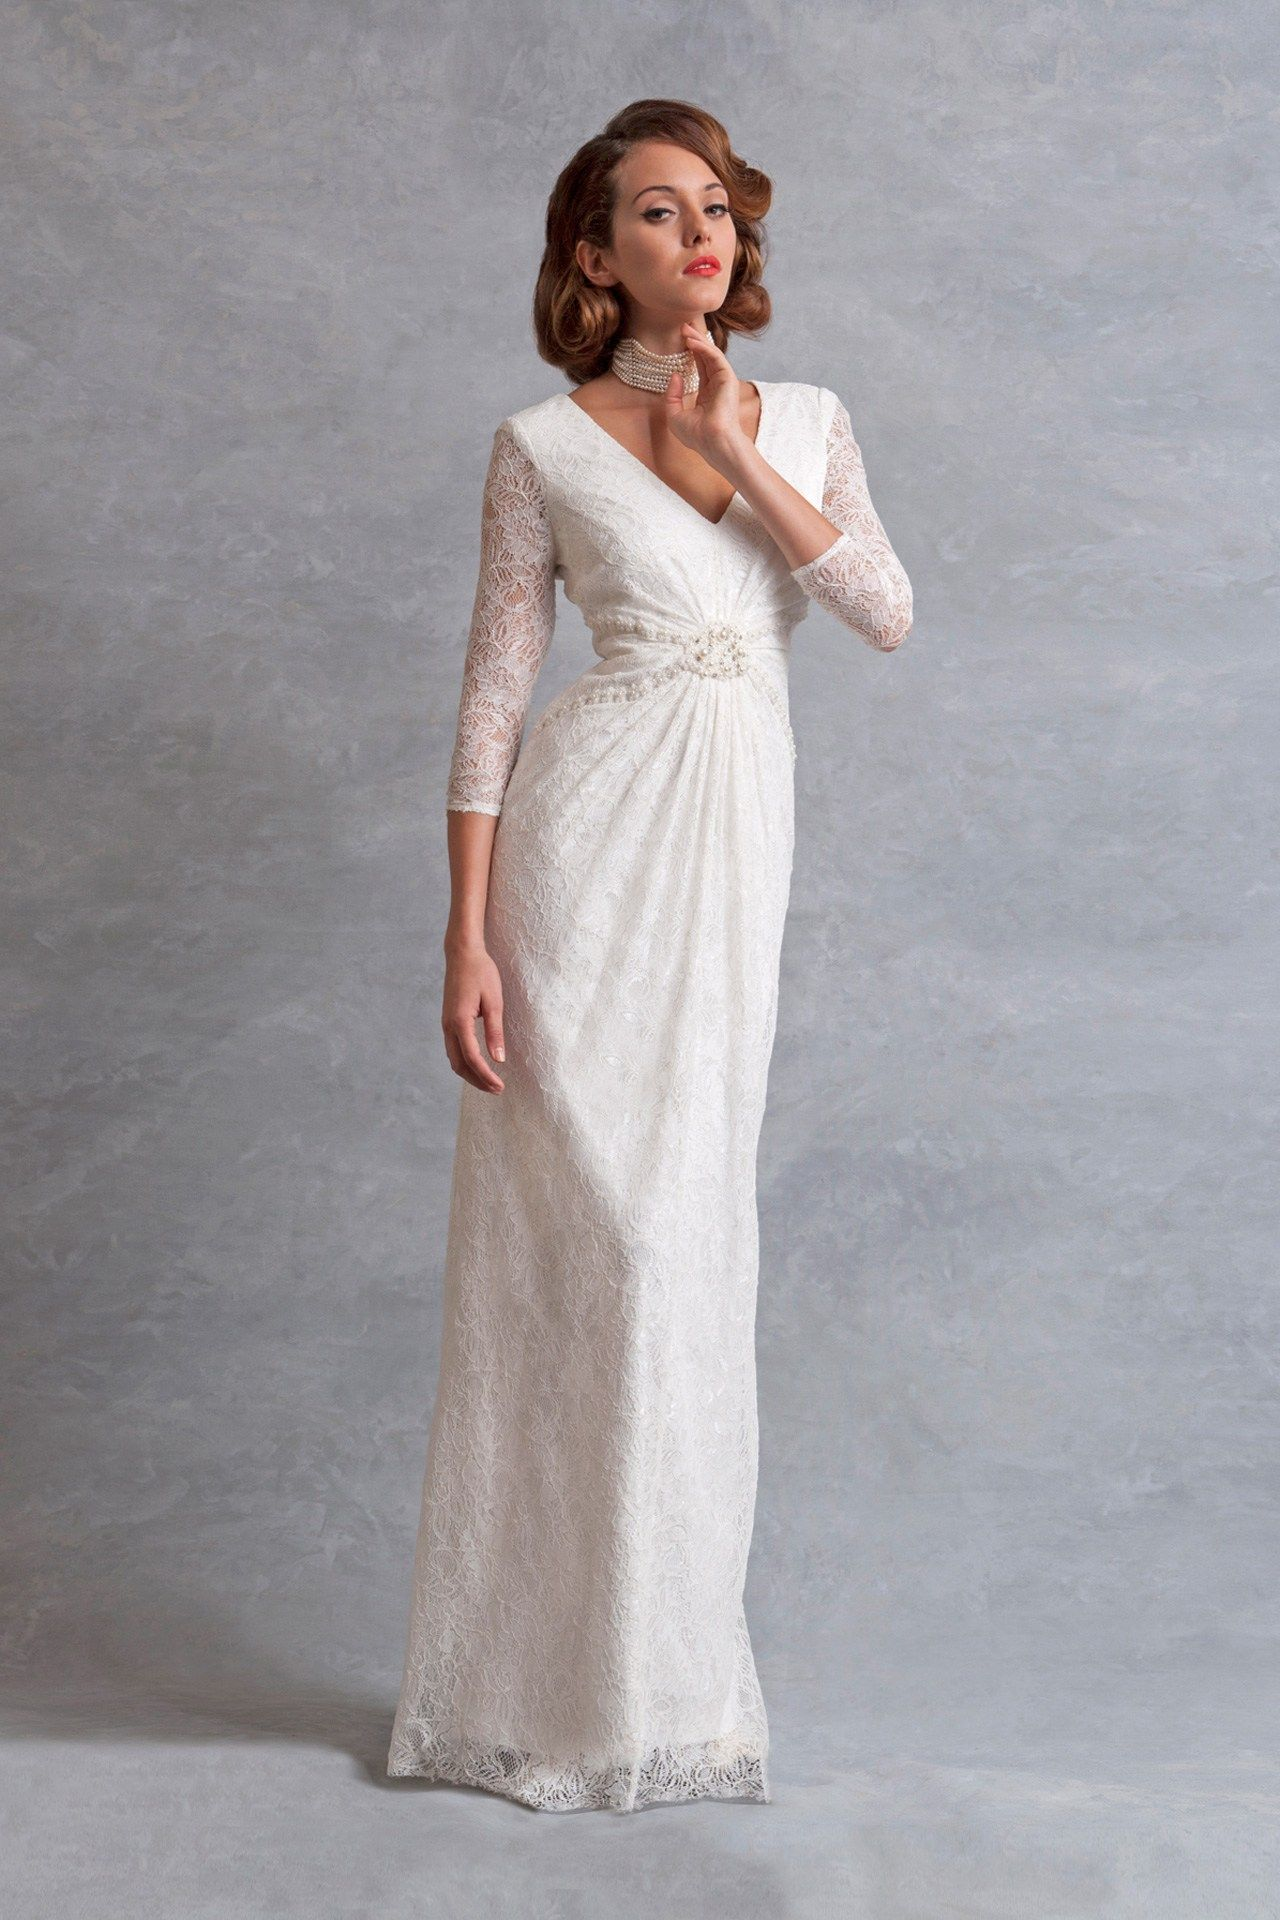 Plus size wedding dress rental  Wedding Dresses  The Ultimate Gallery BridesMagazine